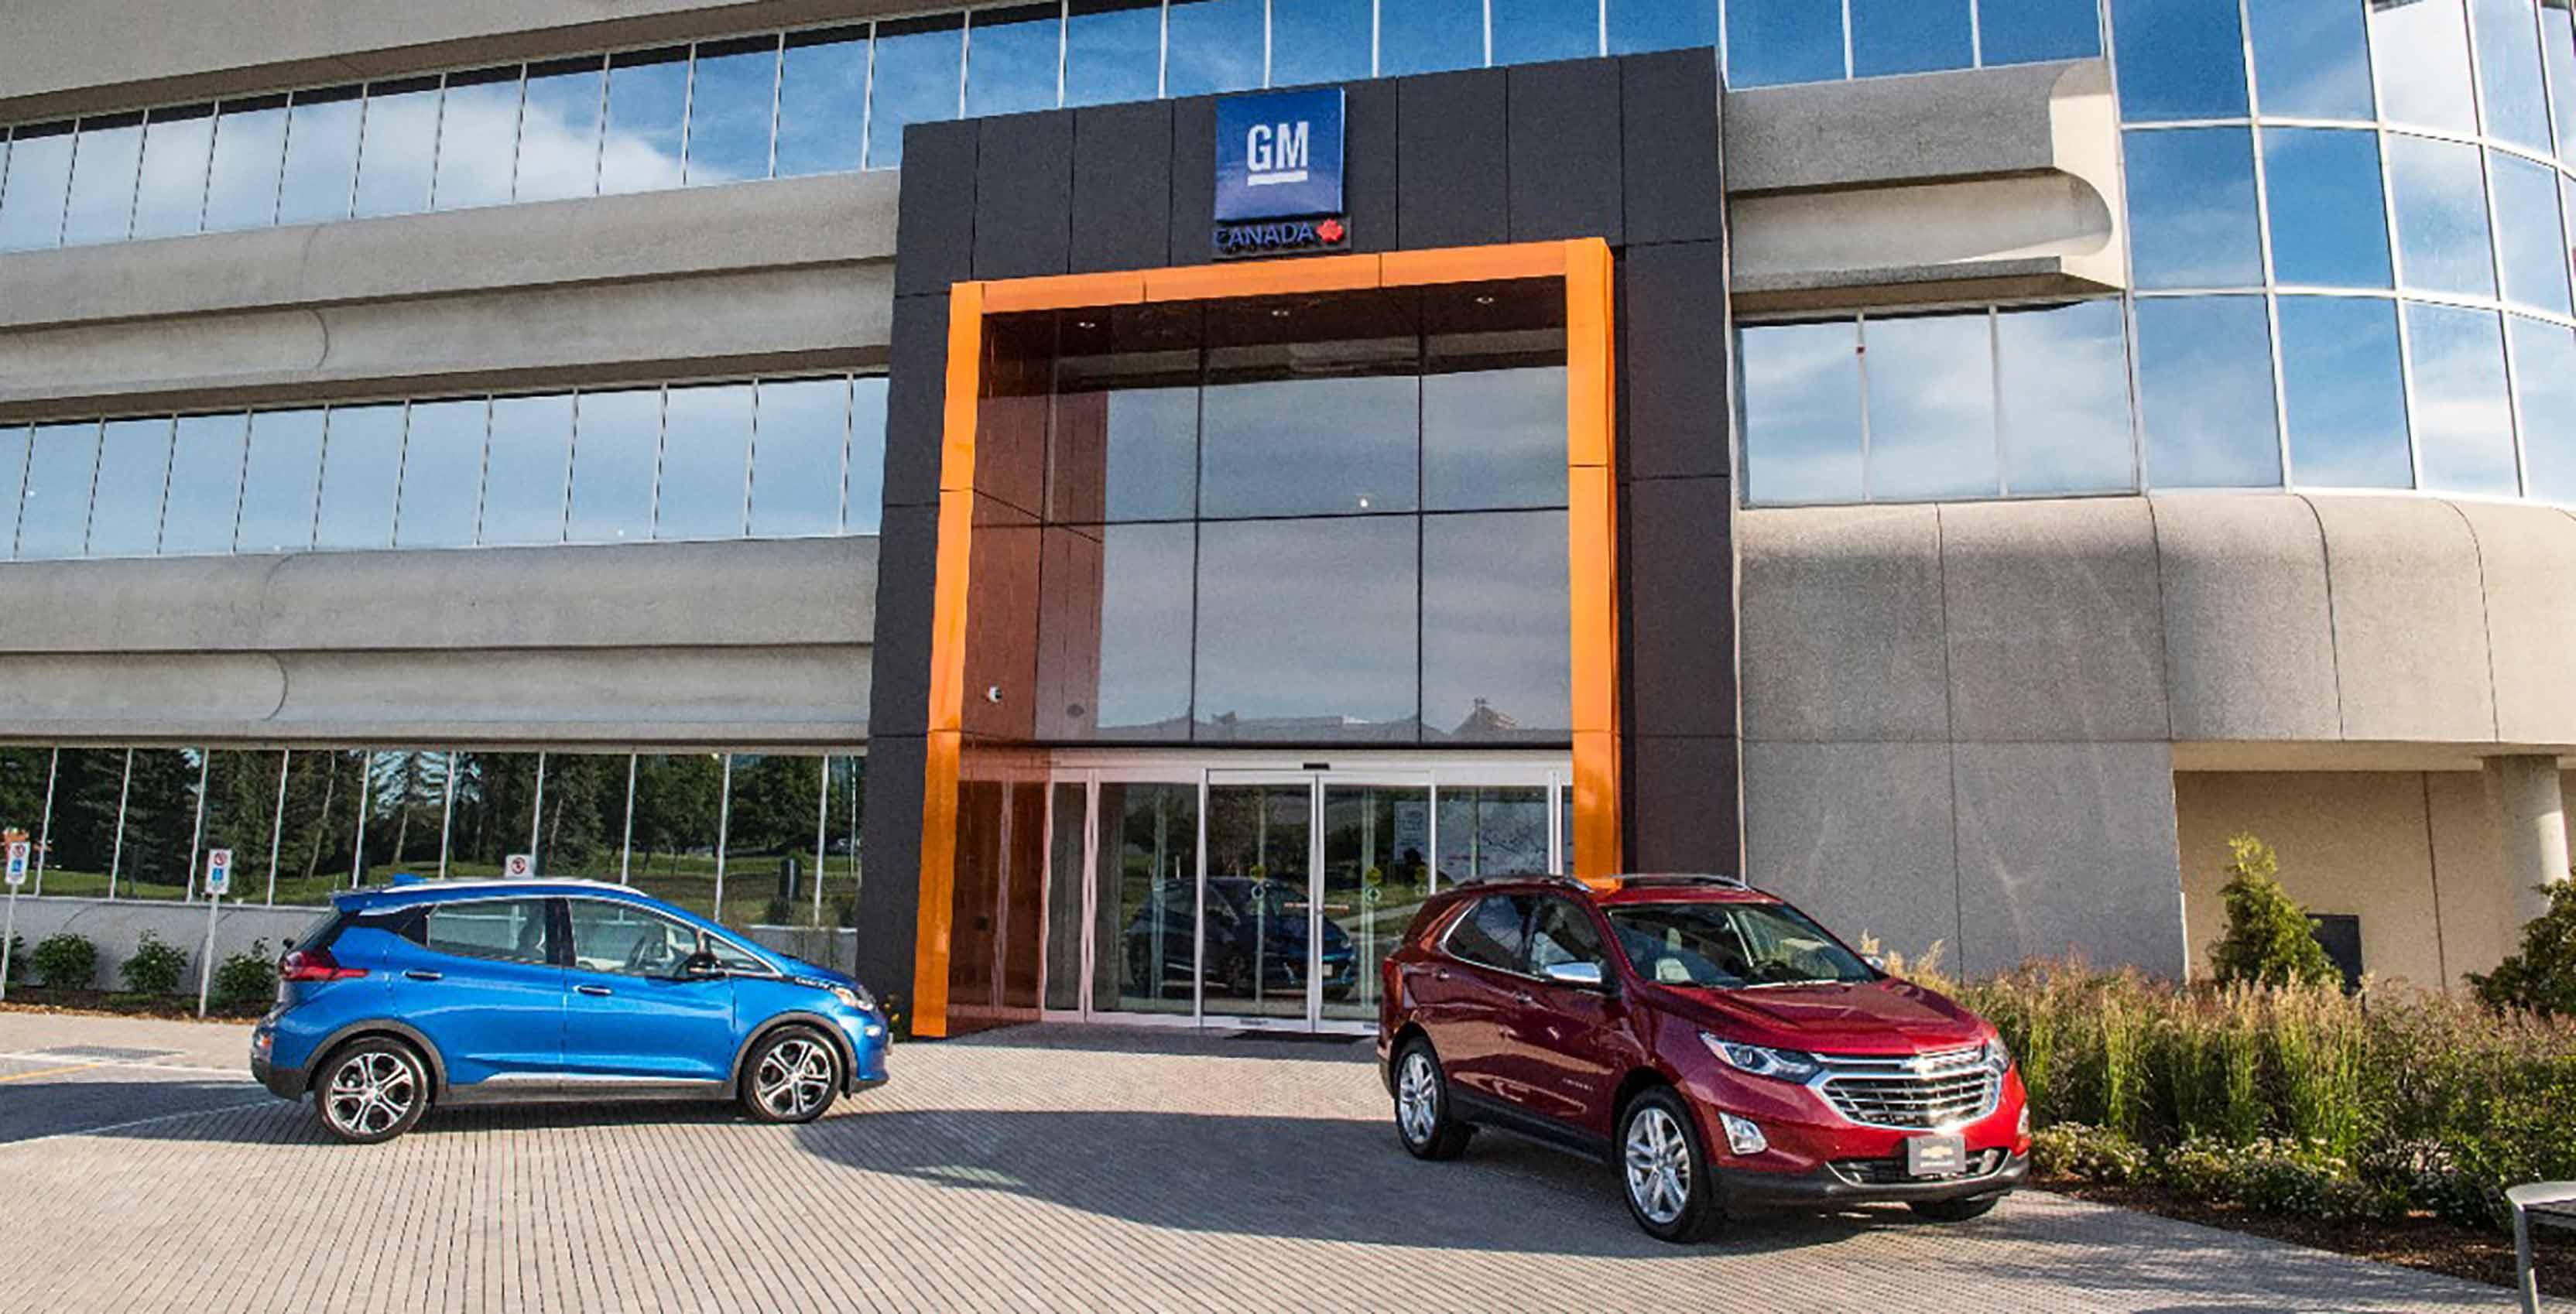 GM Canada building